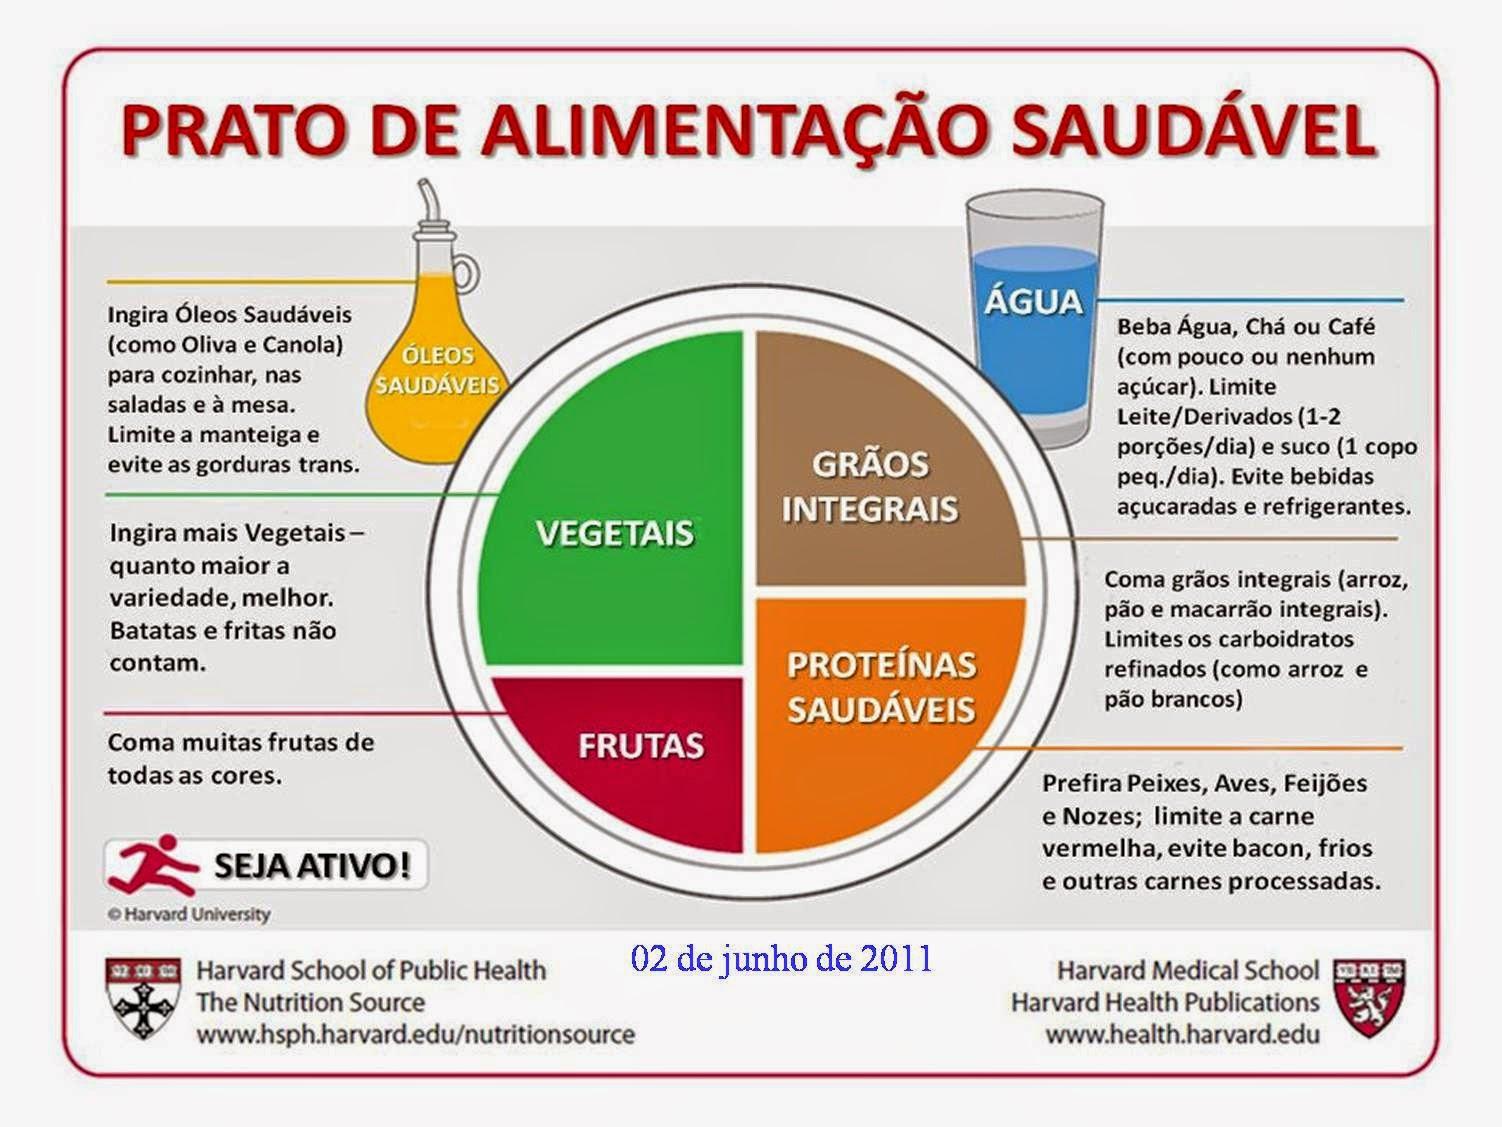 Guia alimentar 2011